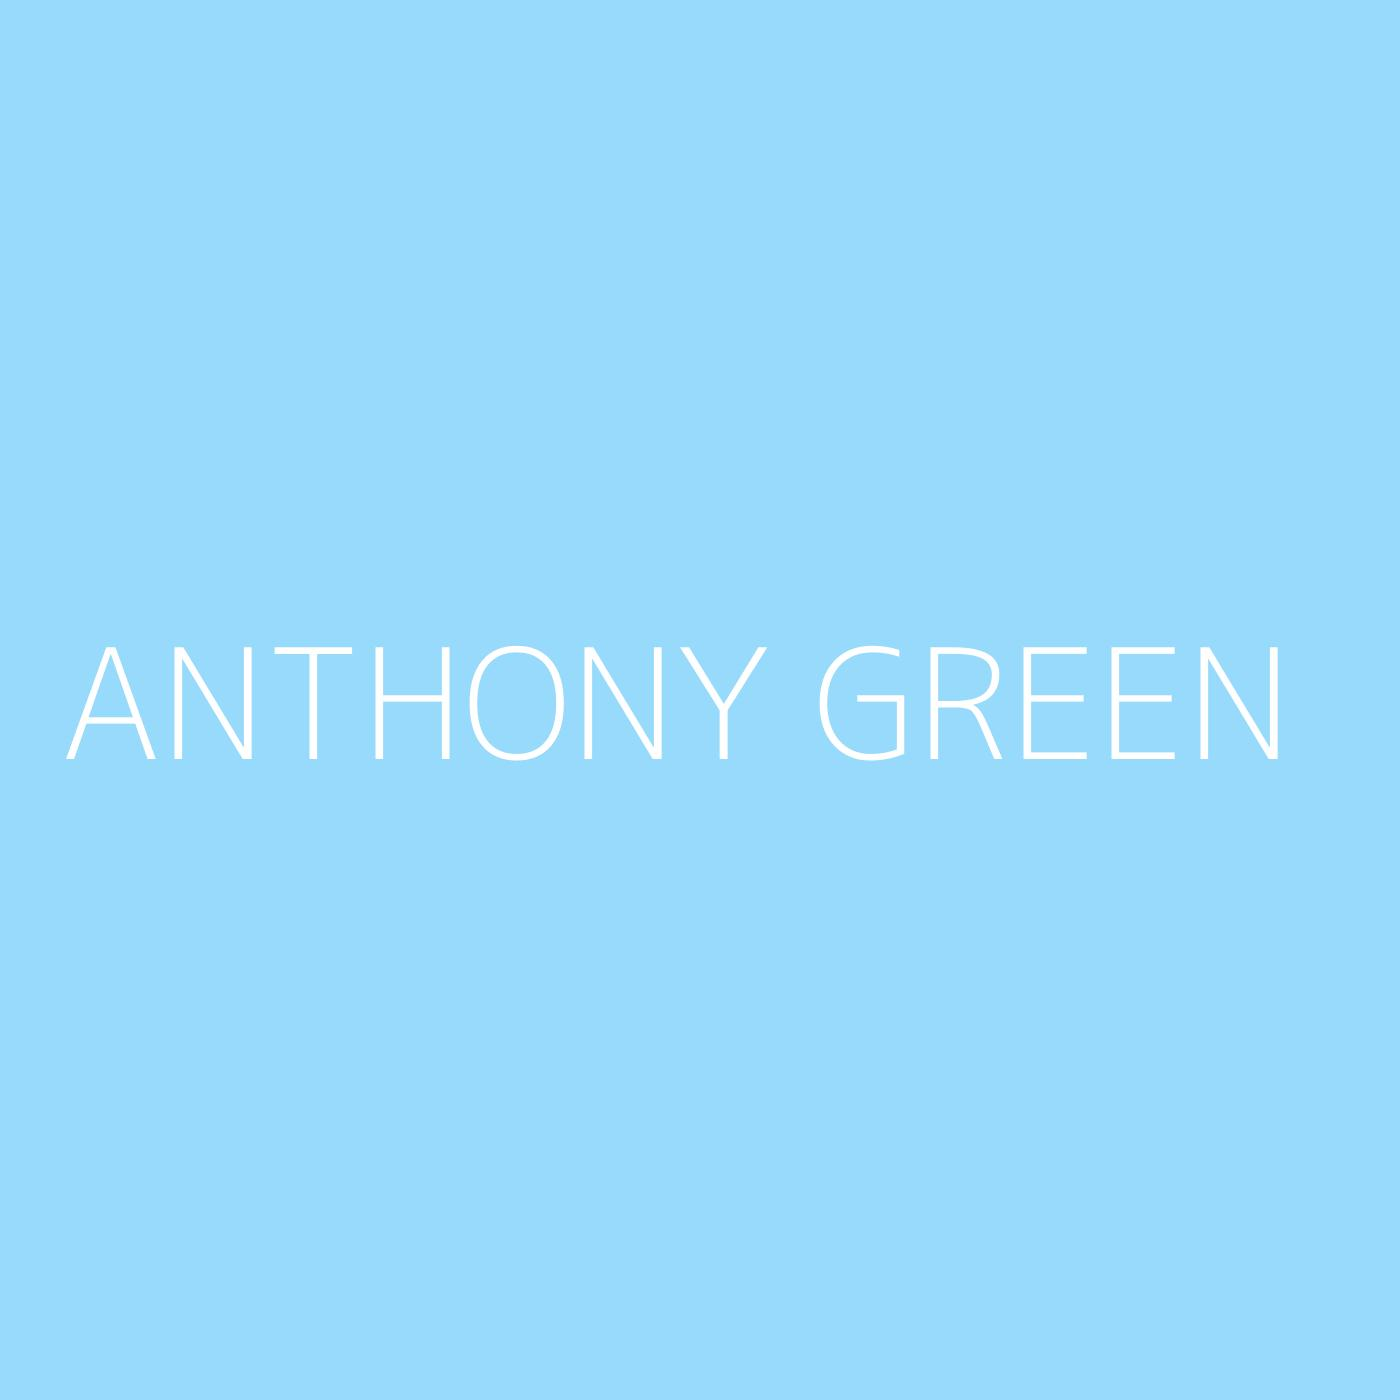 Anthony Green Playlist Artwork